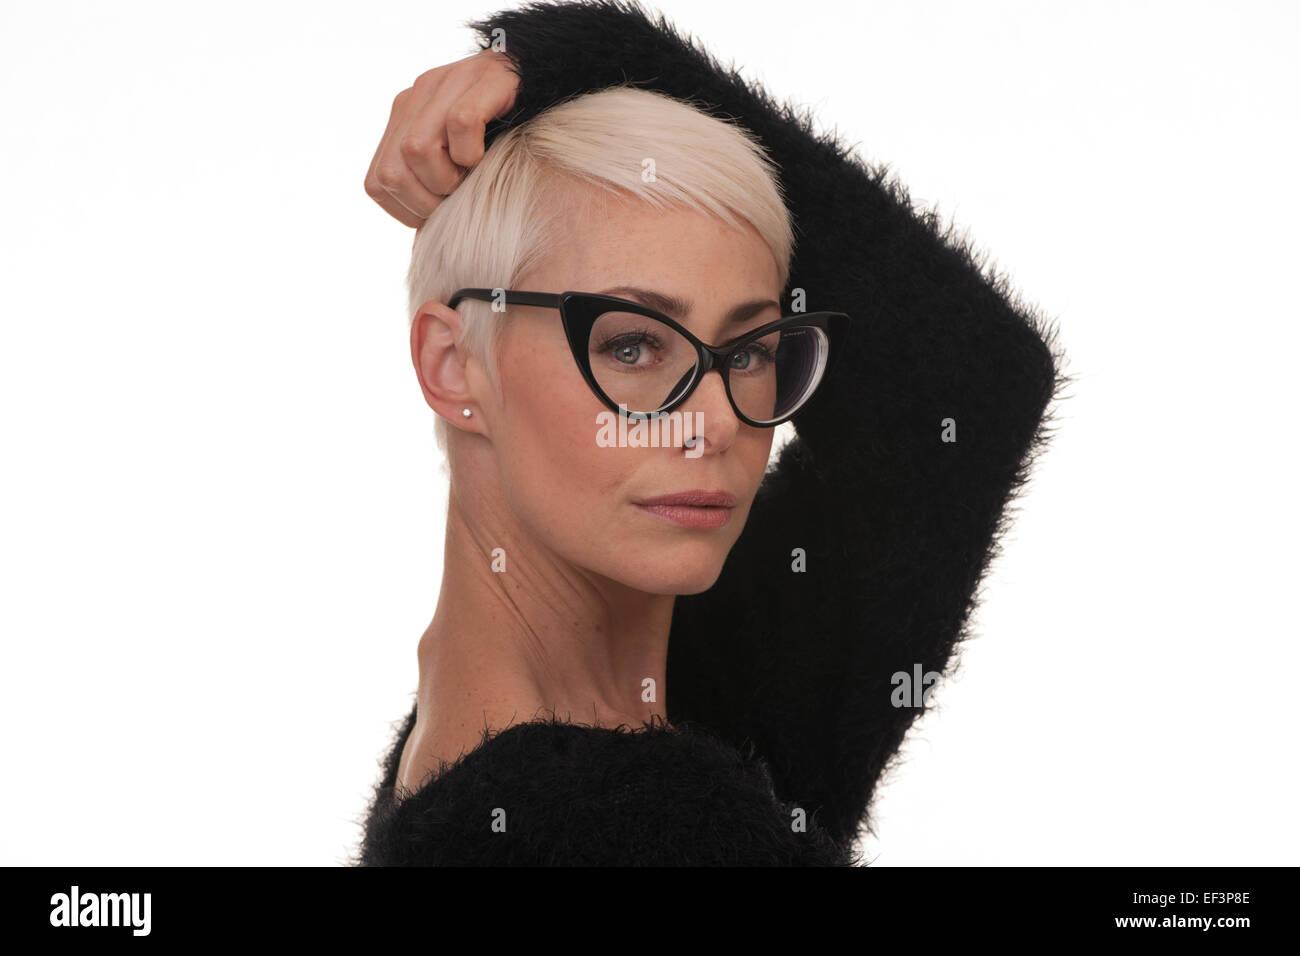 mature woman wearing big black framed glasses stock photo: 78144654